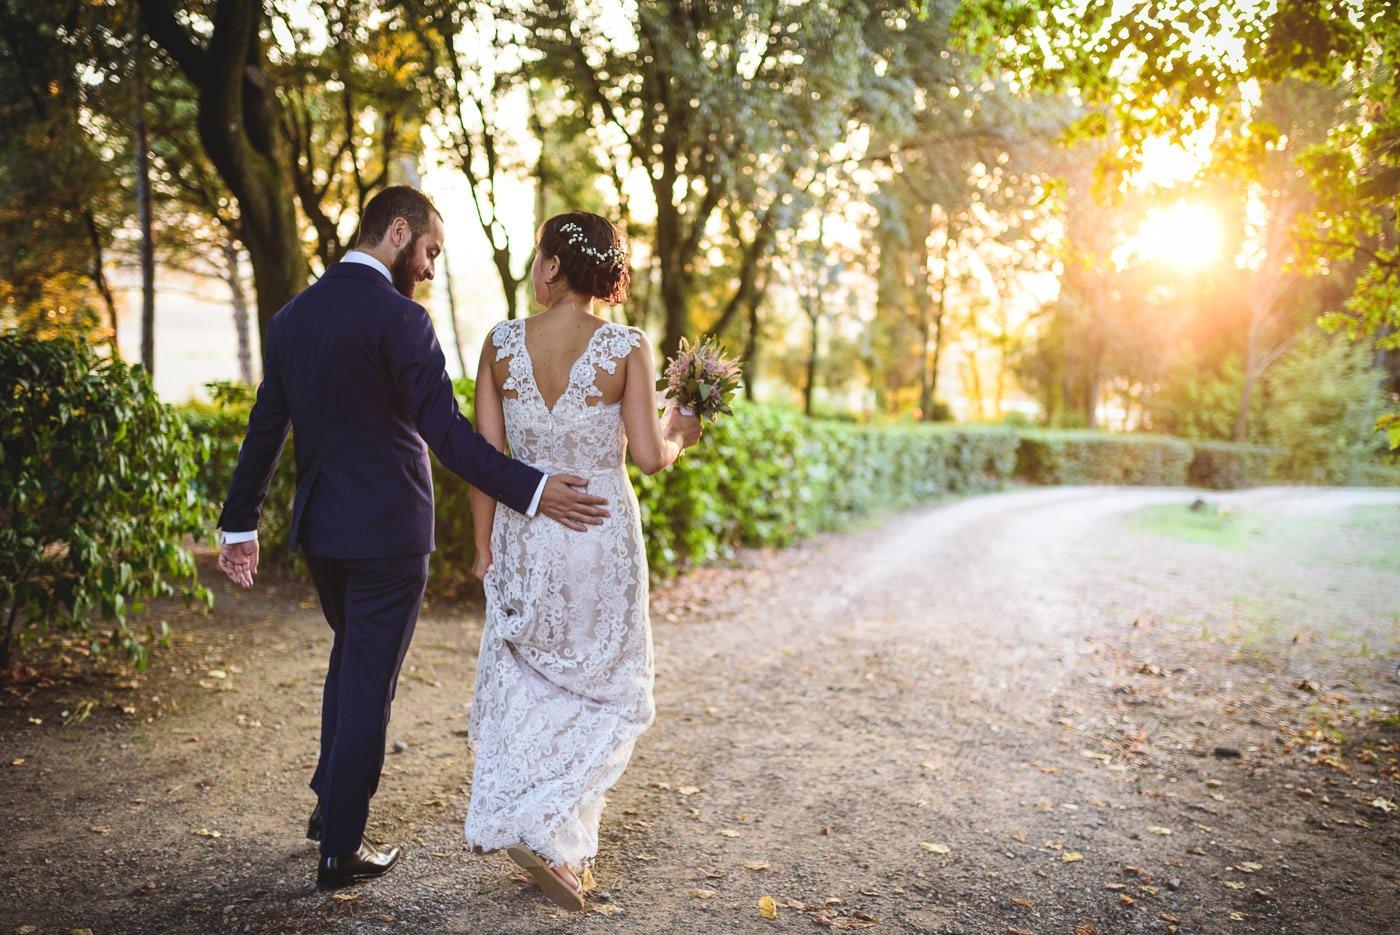 Matrimonio Giulia & Federico 09_15 – Alessio Nobili Photographer-43